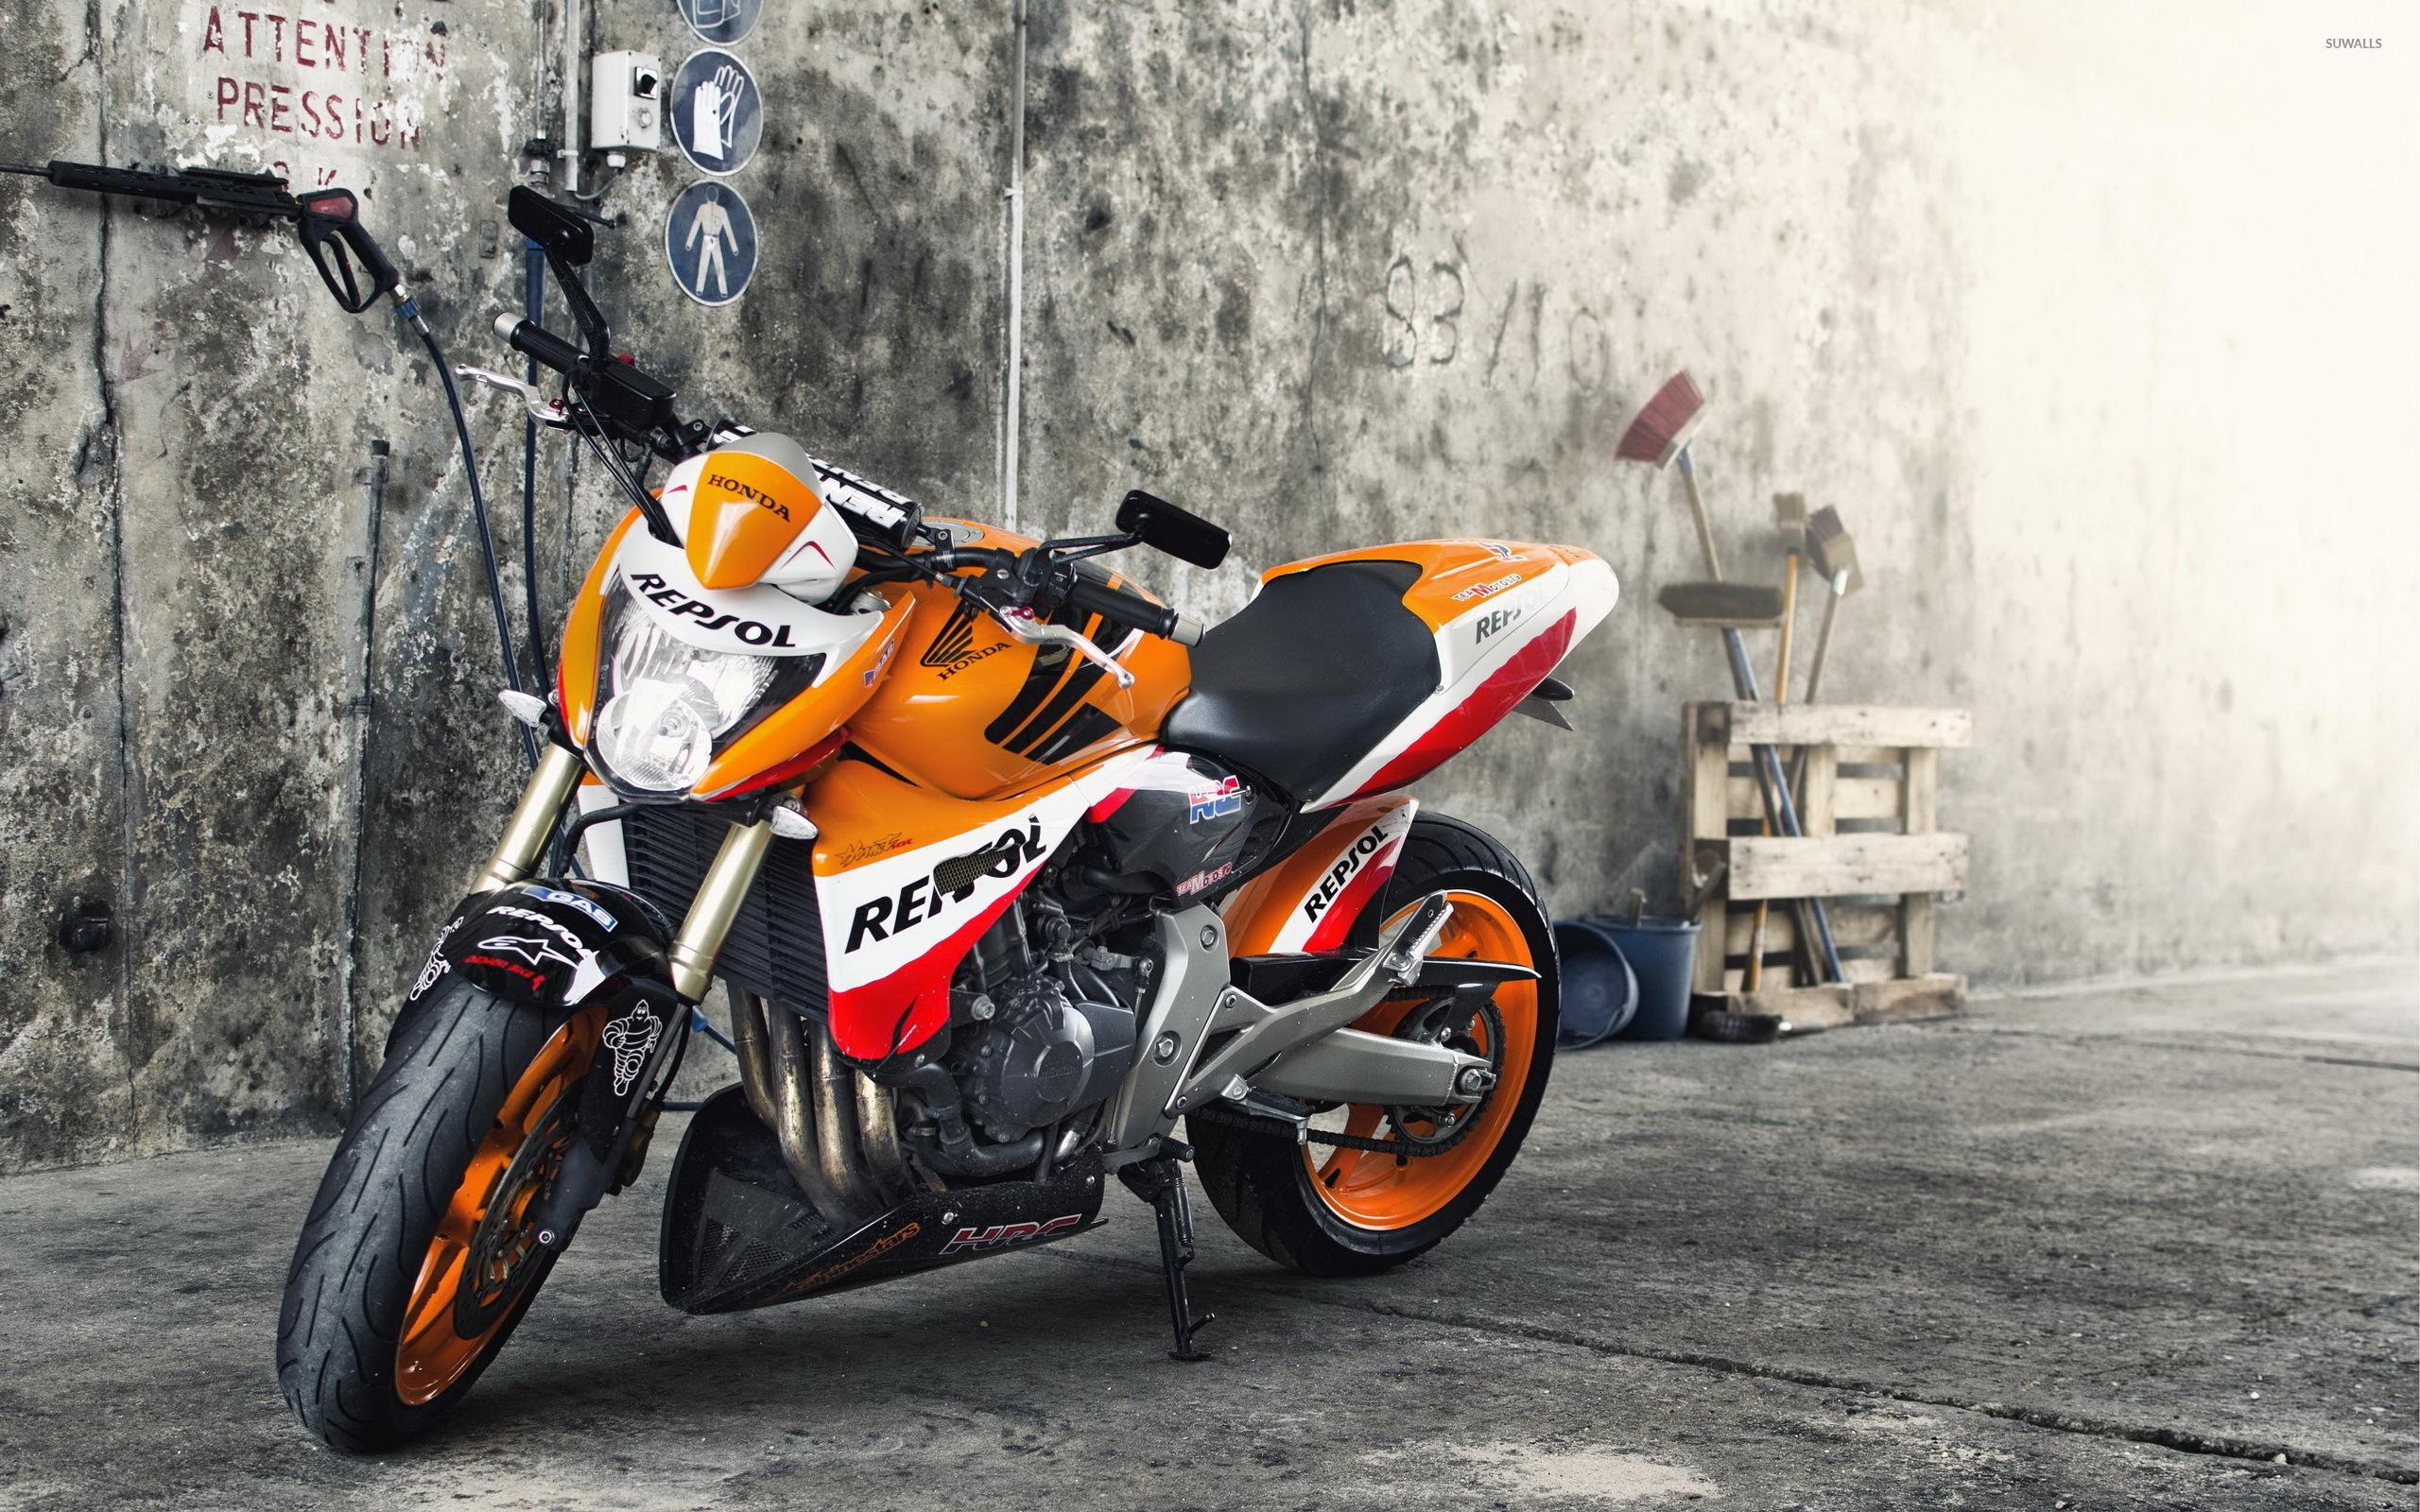 Repsol Honda wallpaper   Motorcycle wallpapers   35026 2560x1600